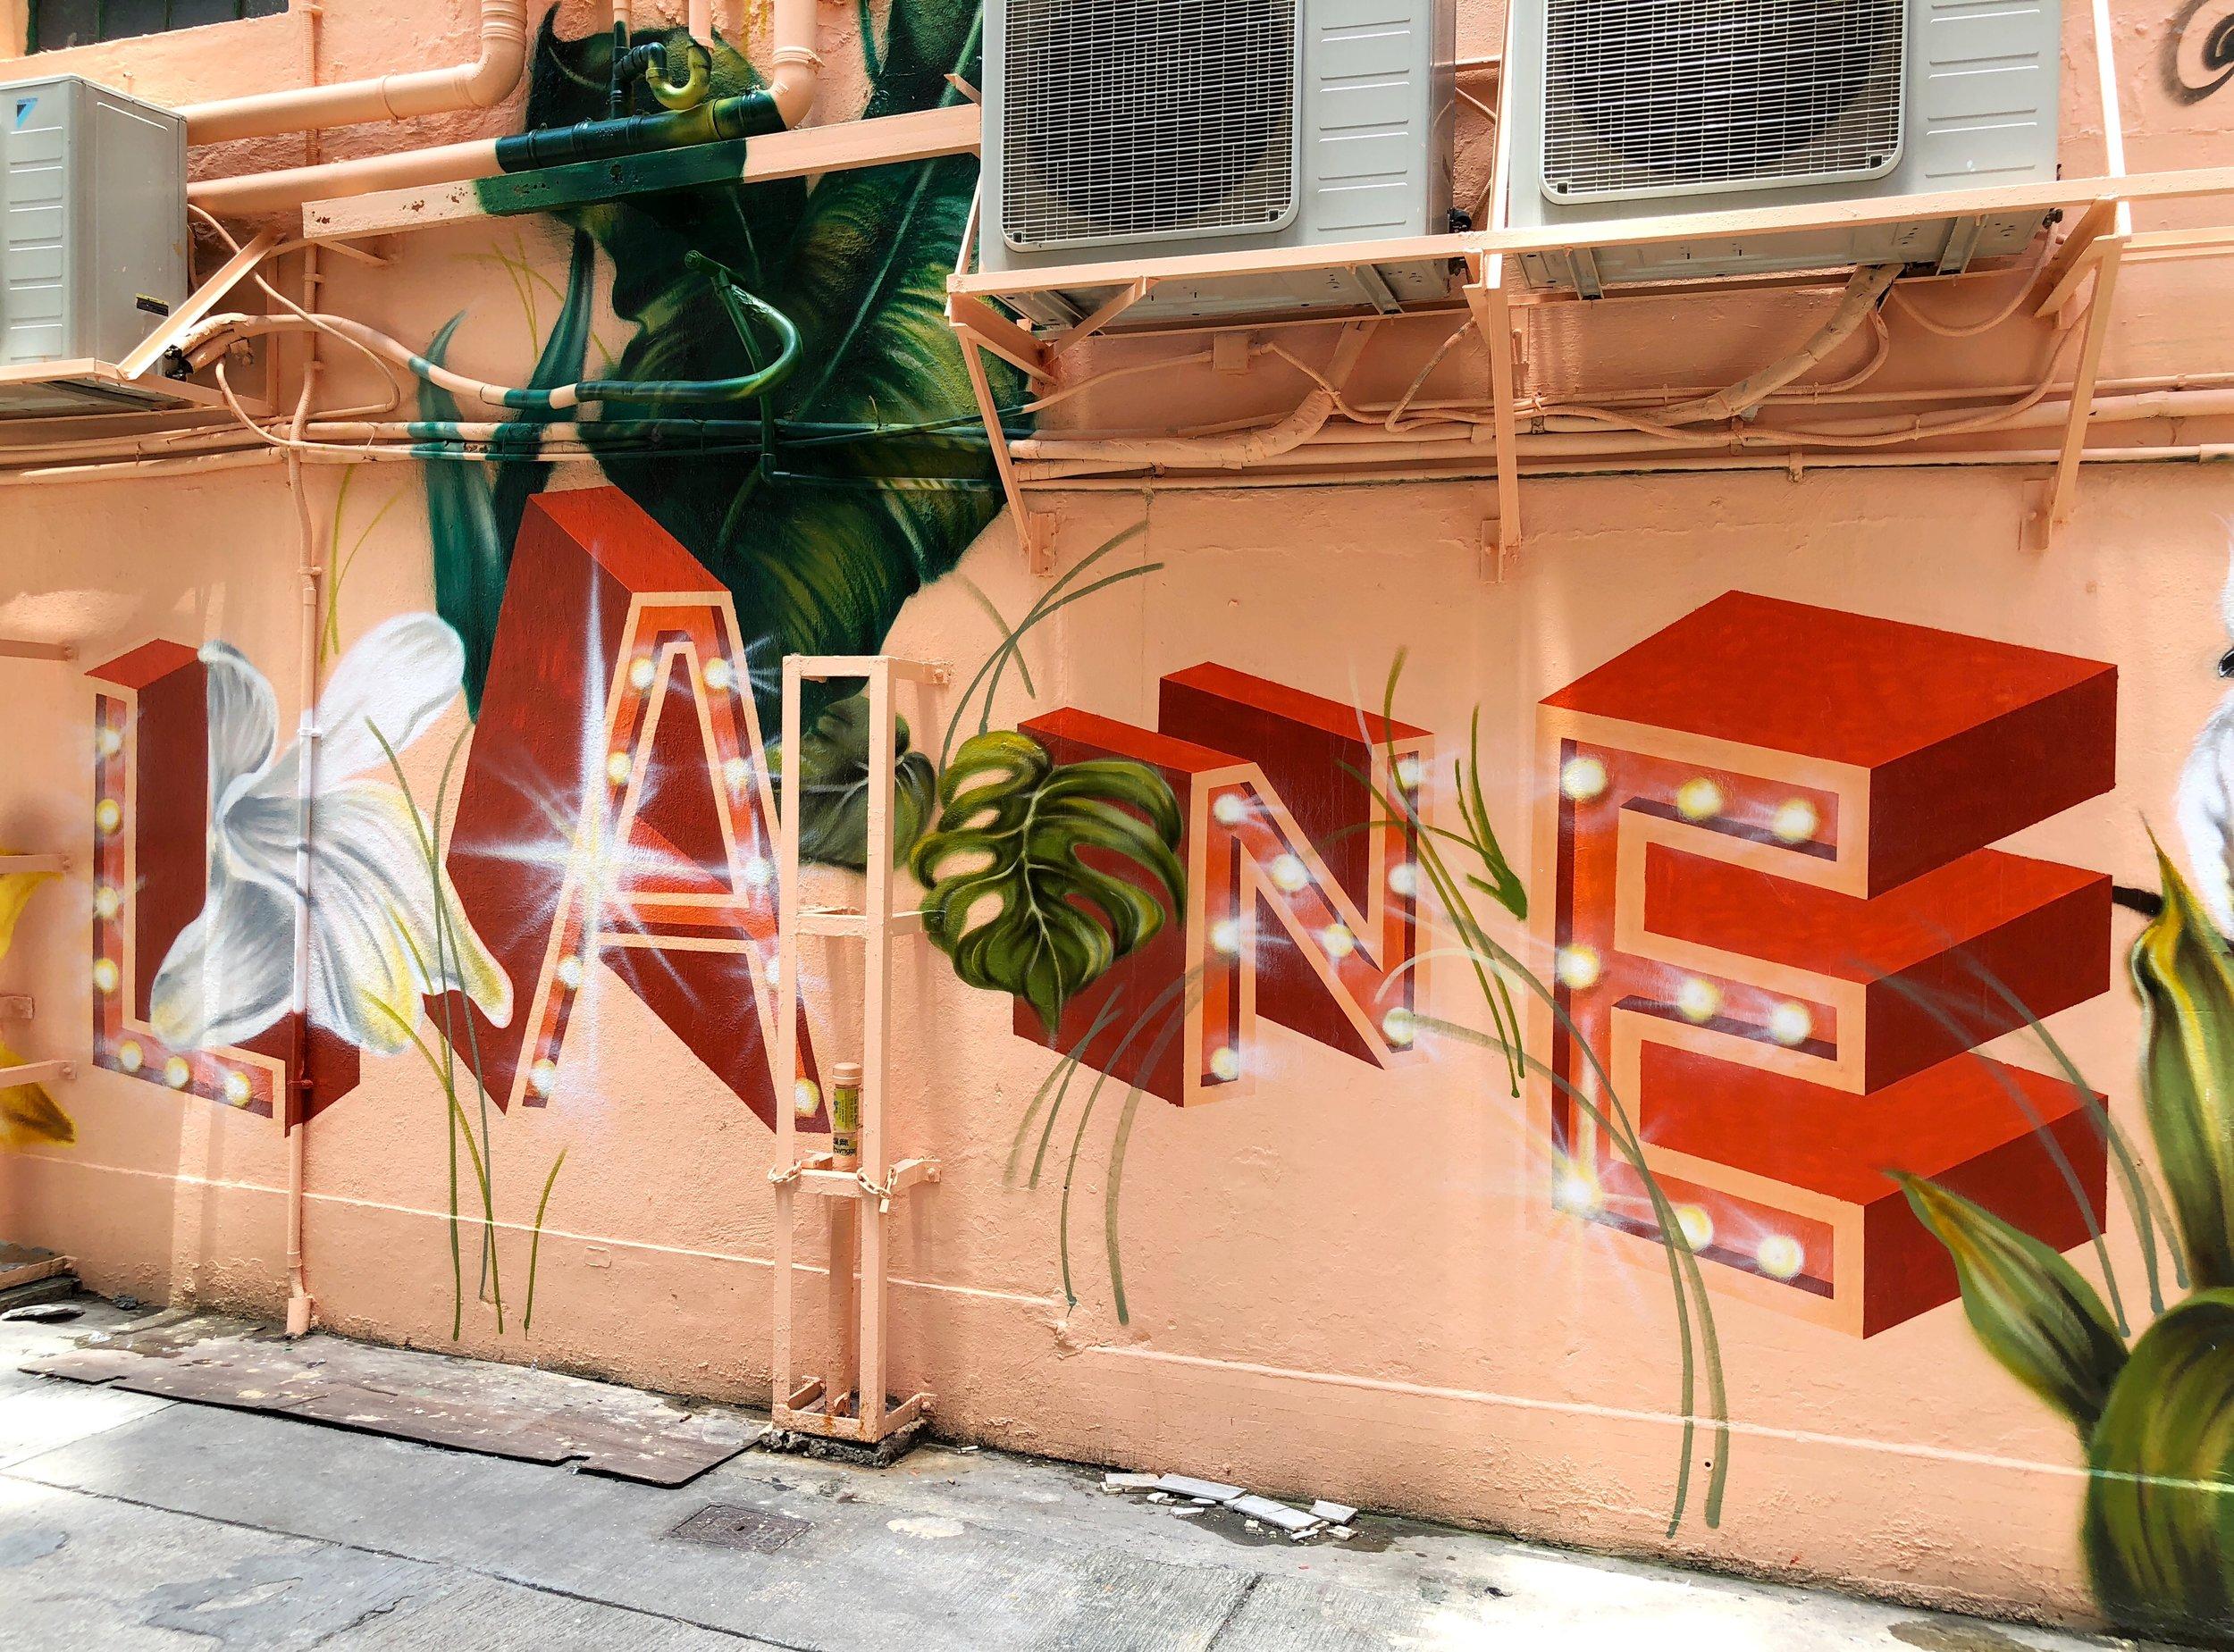 Mural ki ling lane @neillhw #mural #wallart #streetmural #streetart